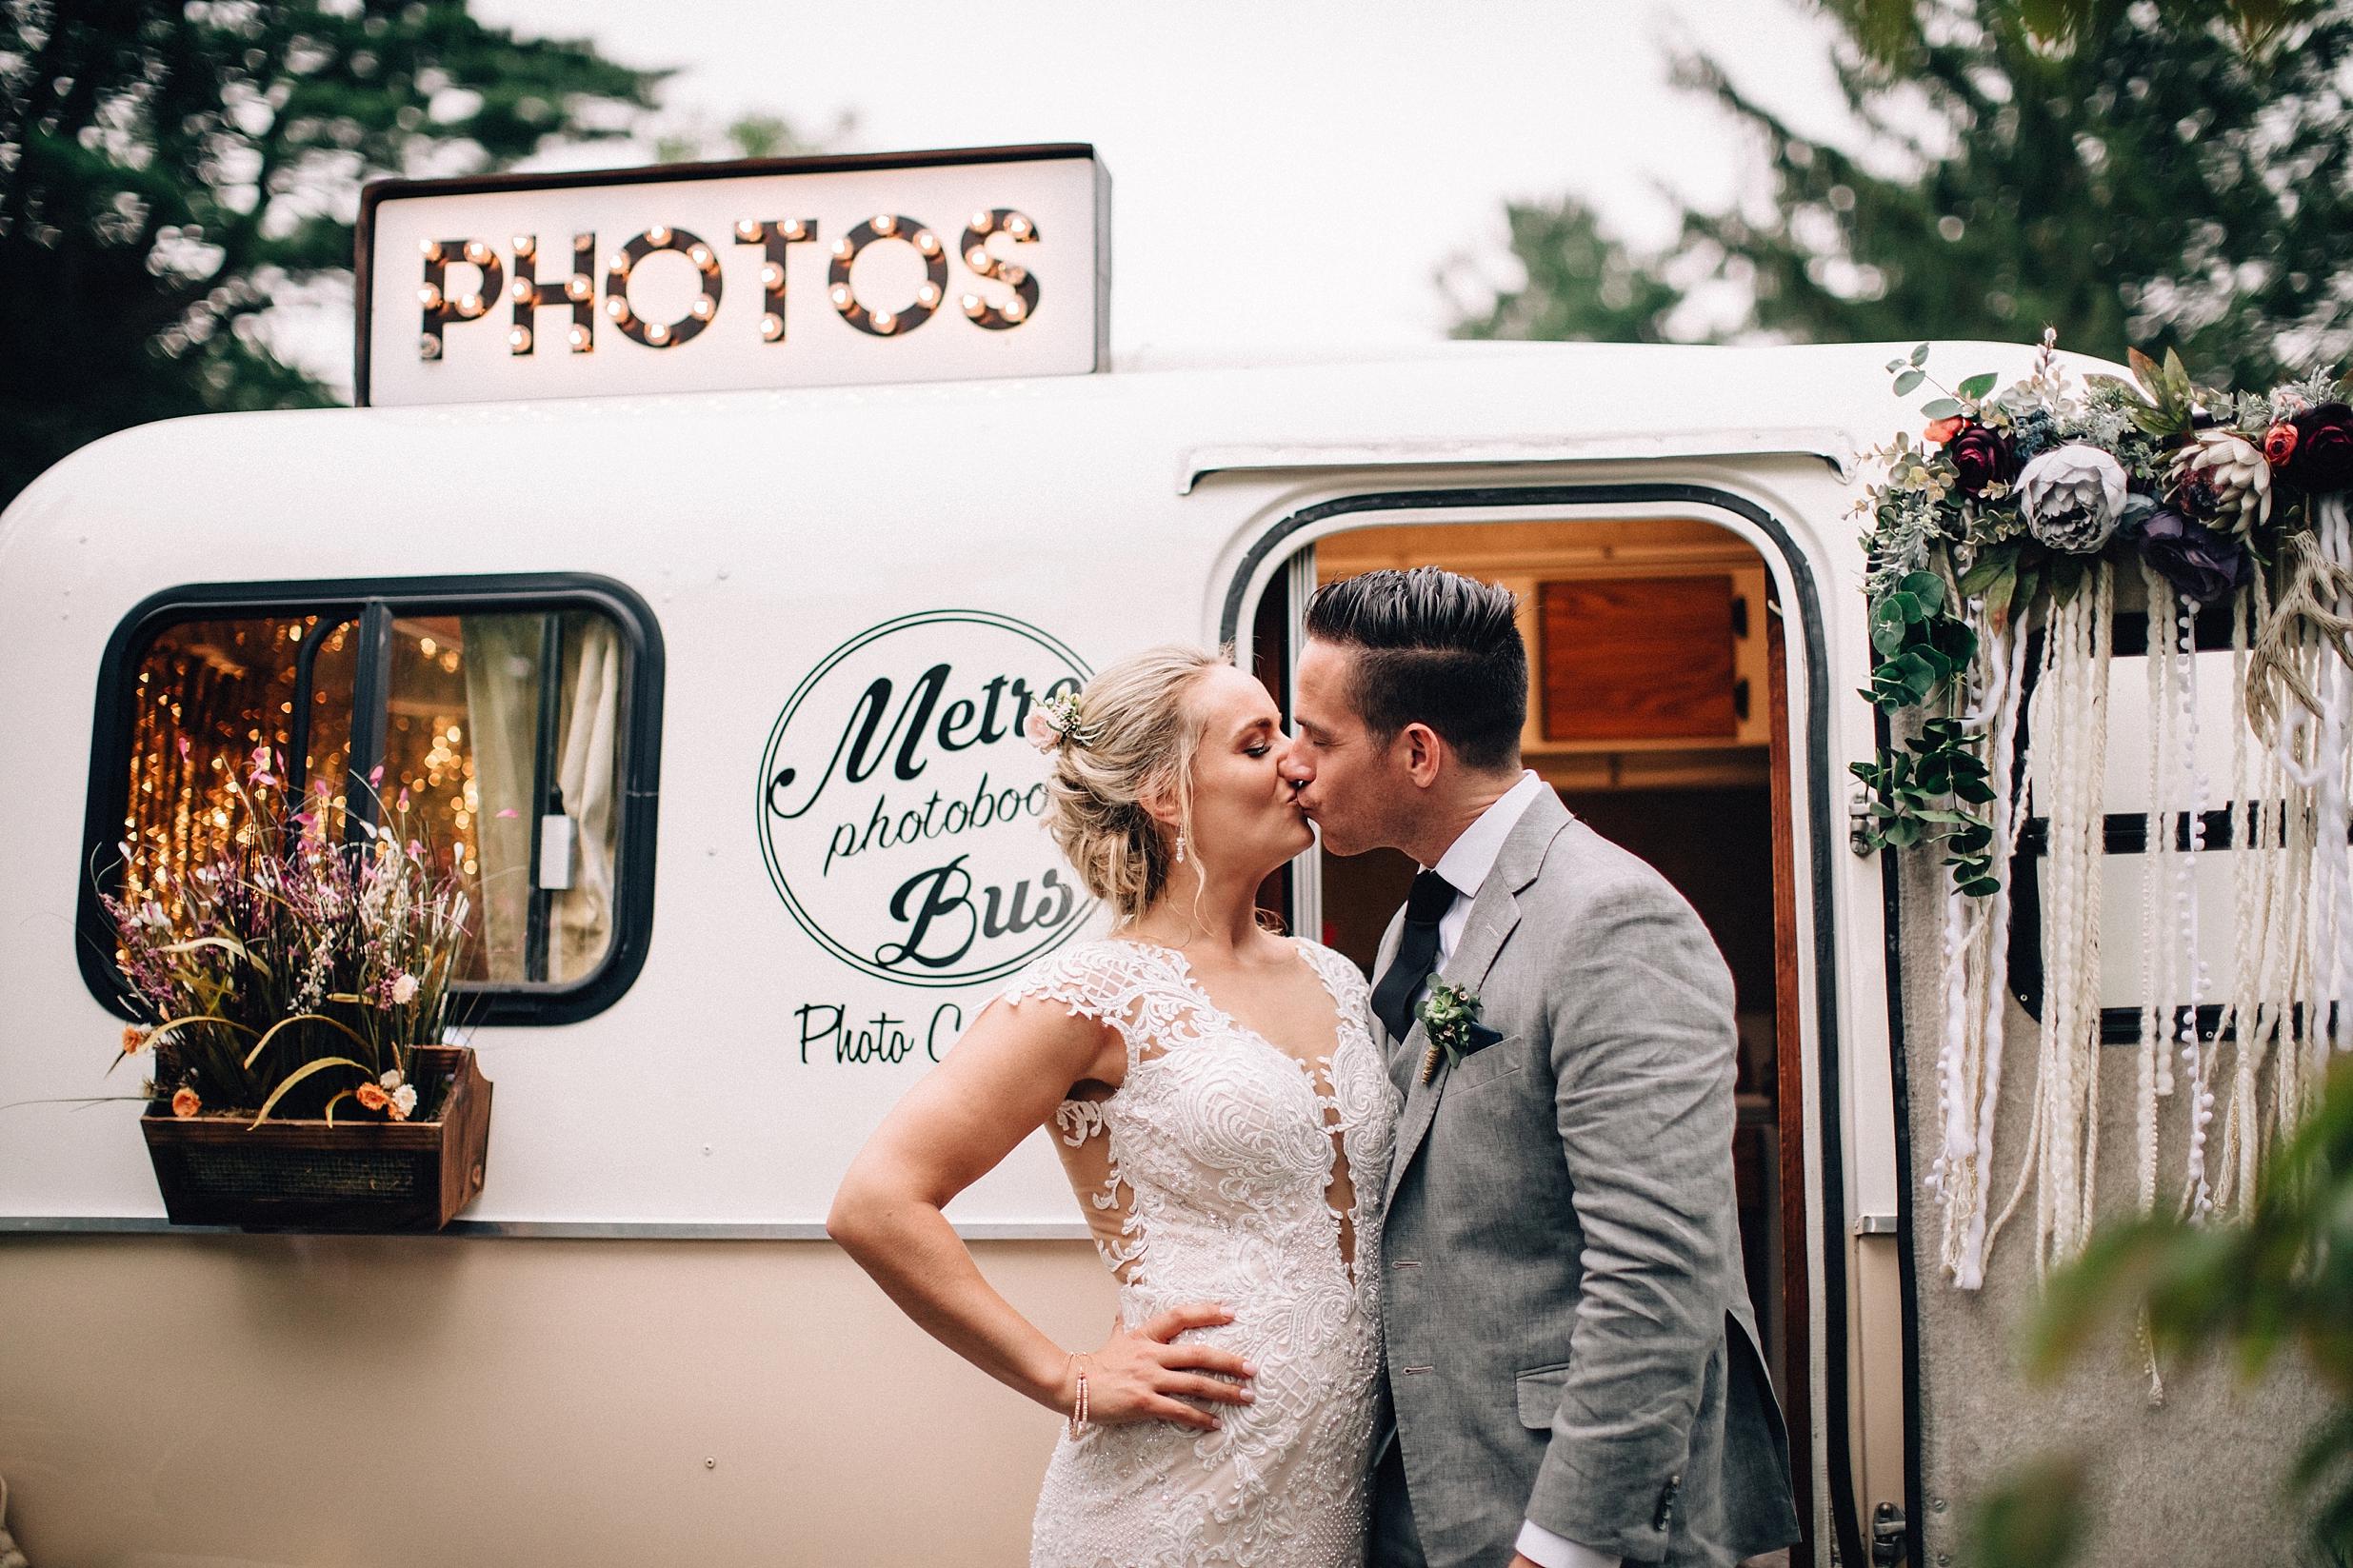 crossed-keys-outdoor-ceremony-camp-wedding-photo_0055.jpg